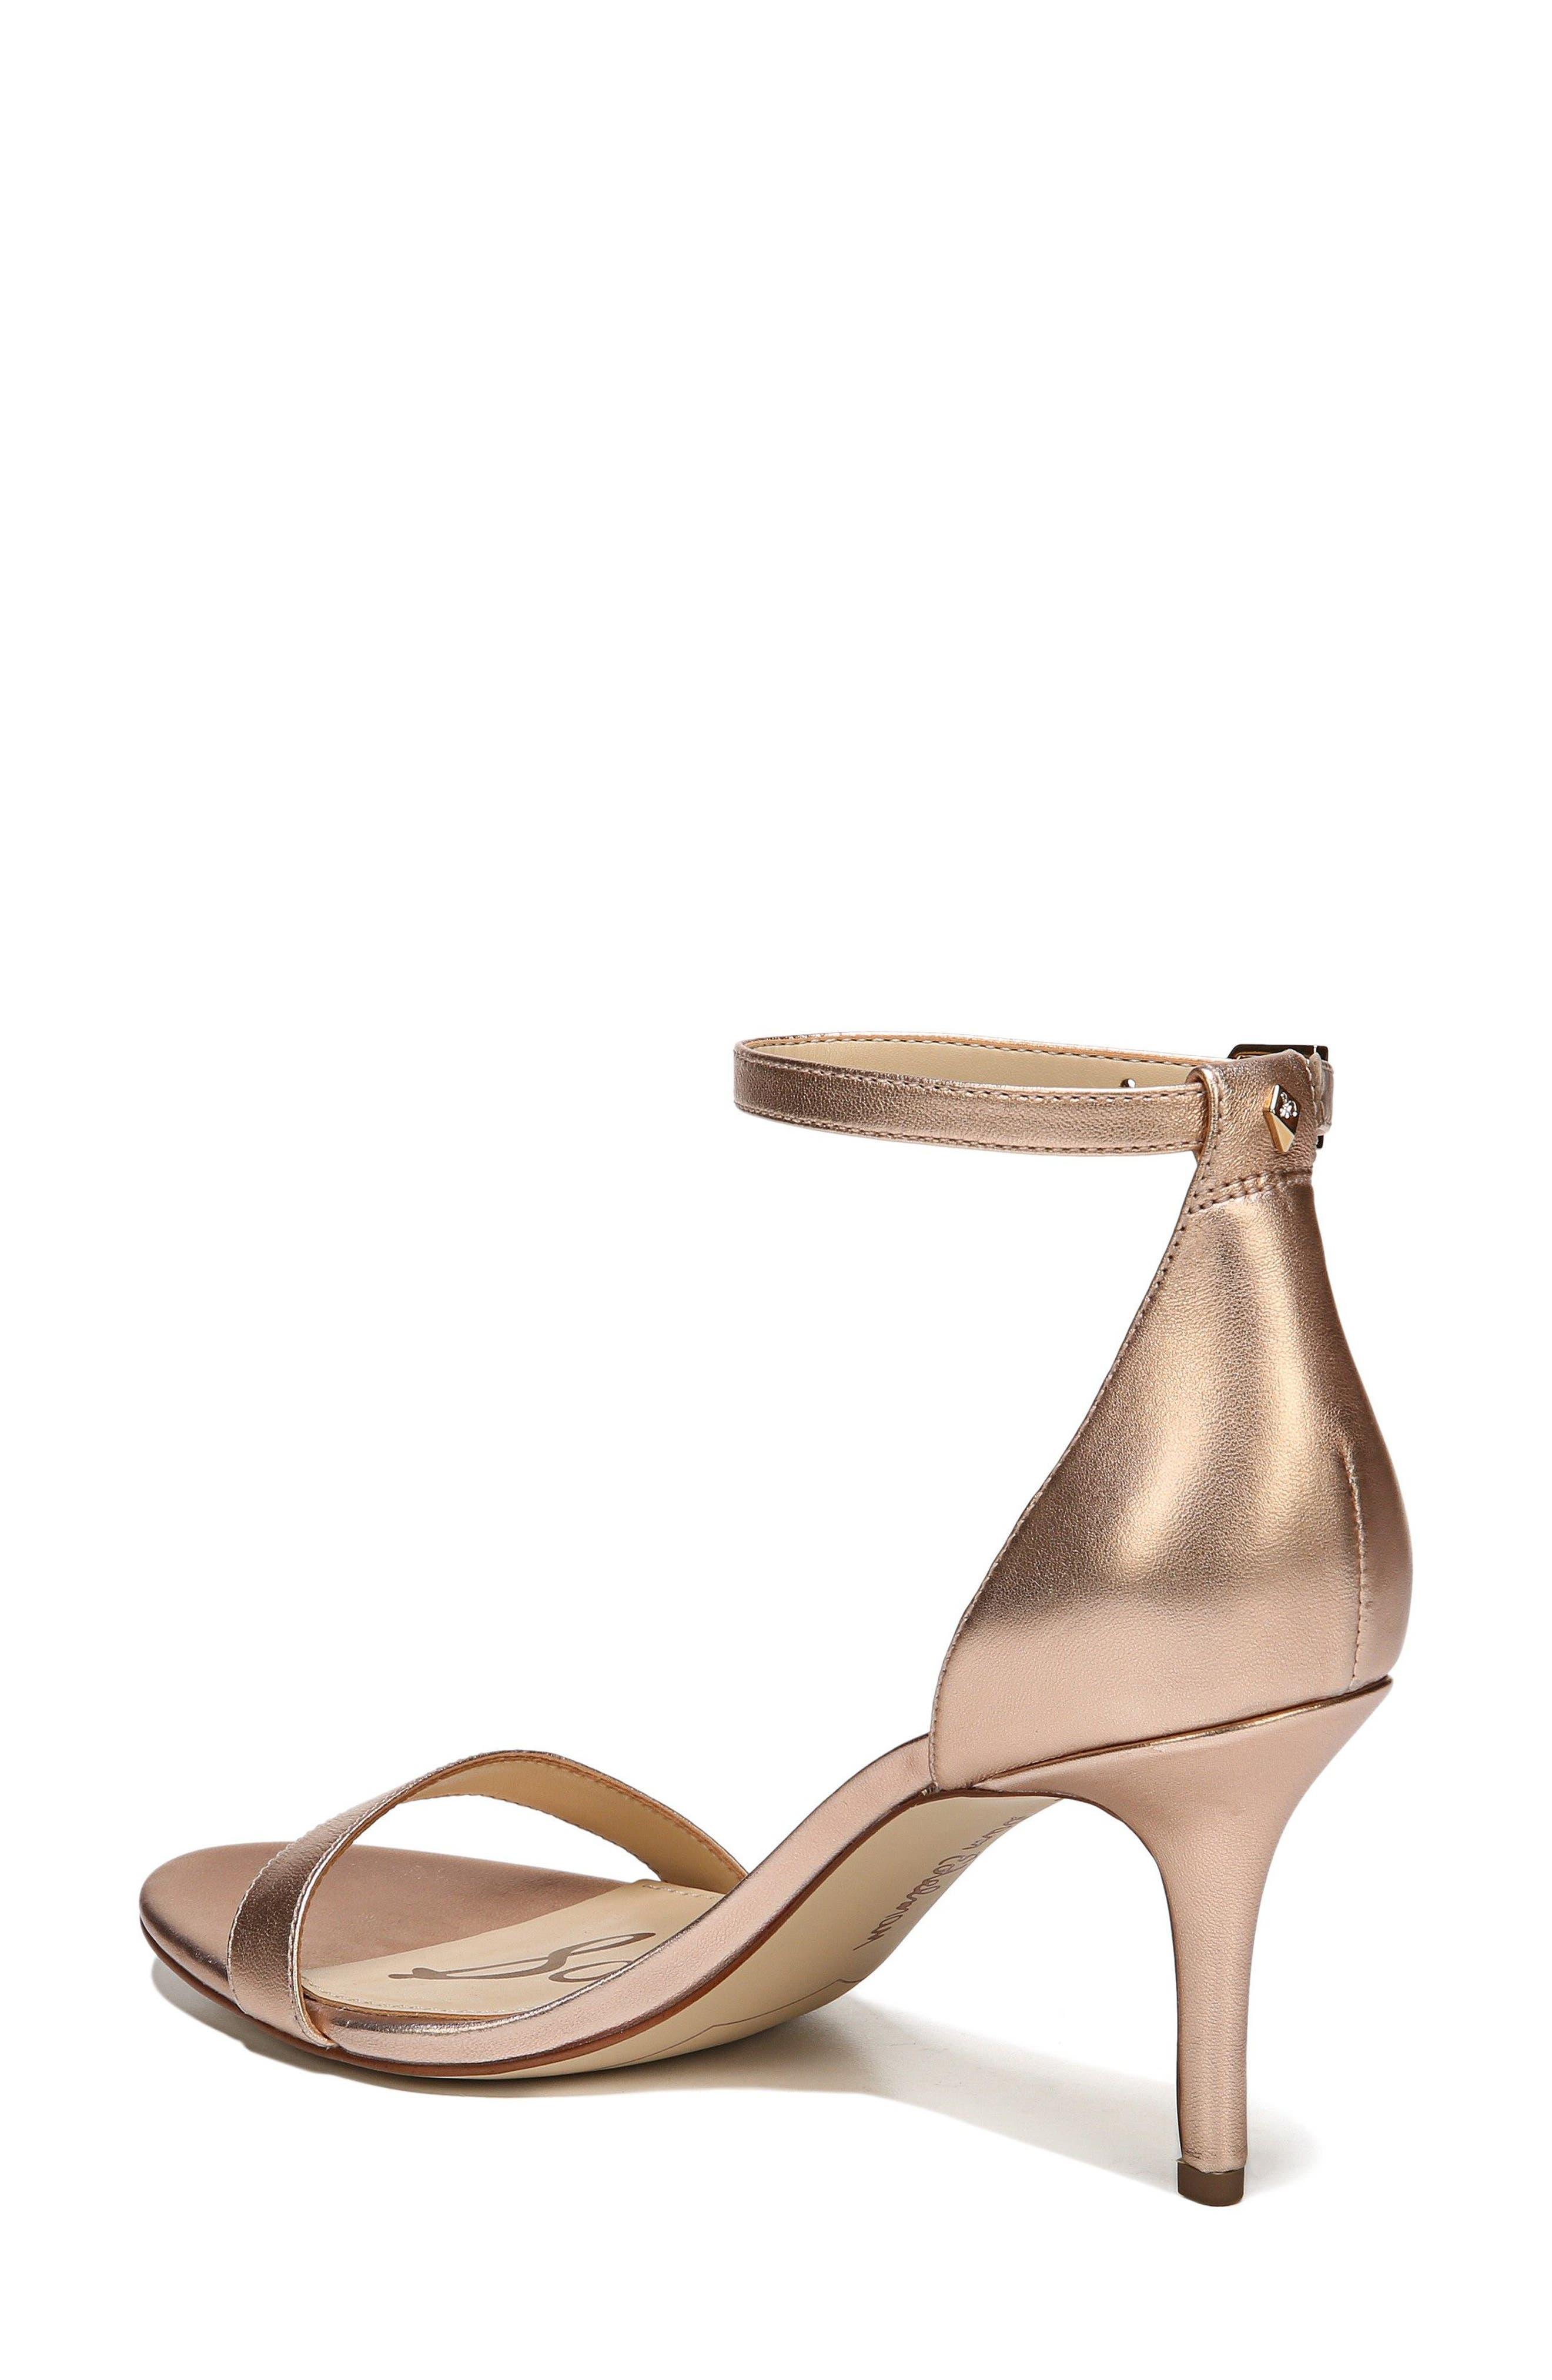 ,                             'Patti' Ankle Strap Sandal,                             Alternate thumbnail 169, color,                             220